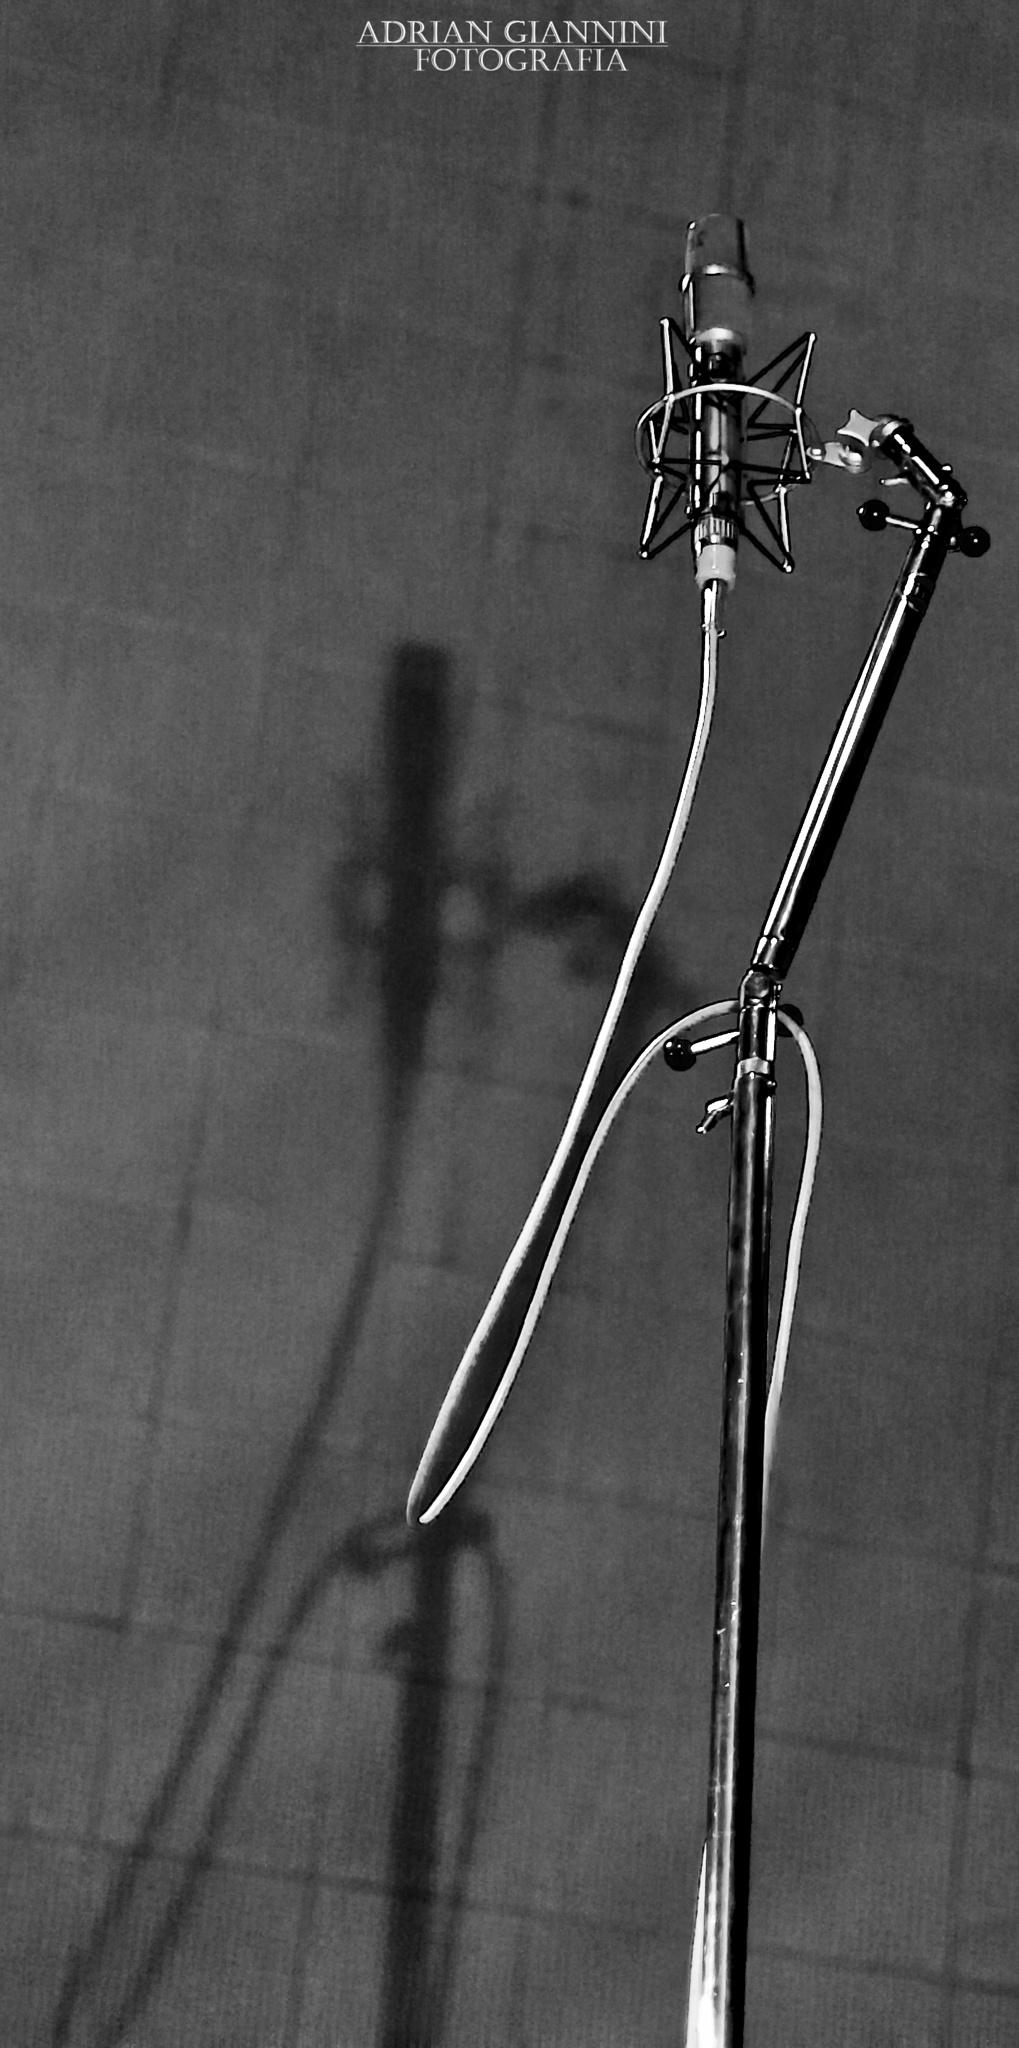 mic2 by Adrian Giannini